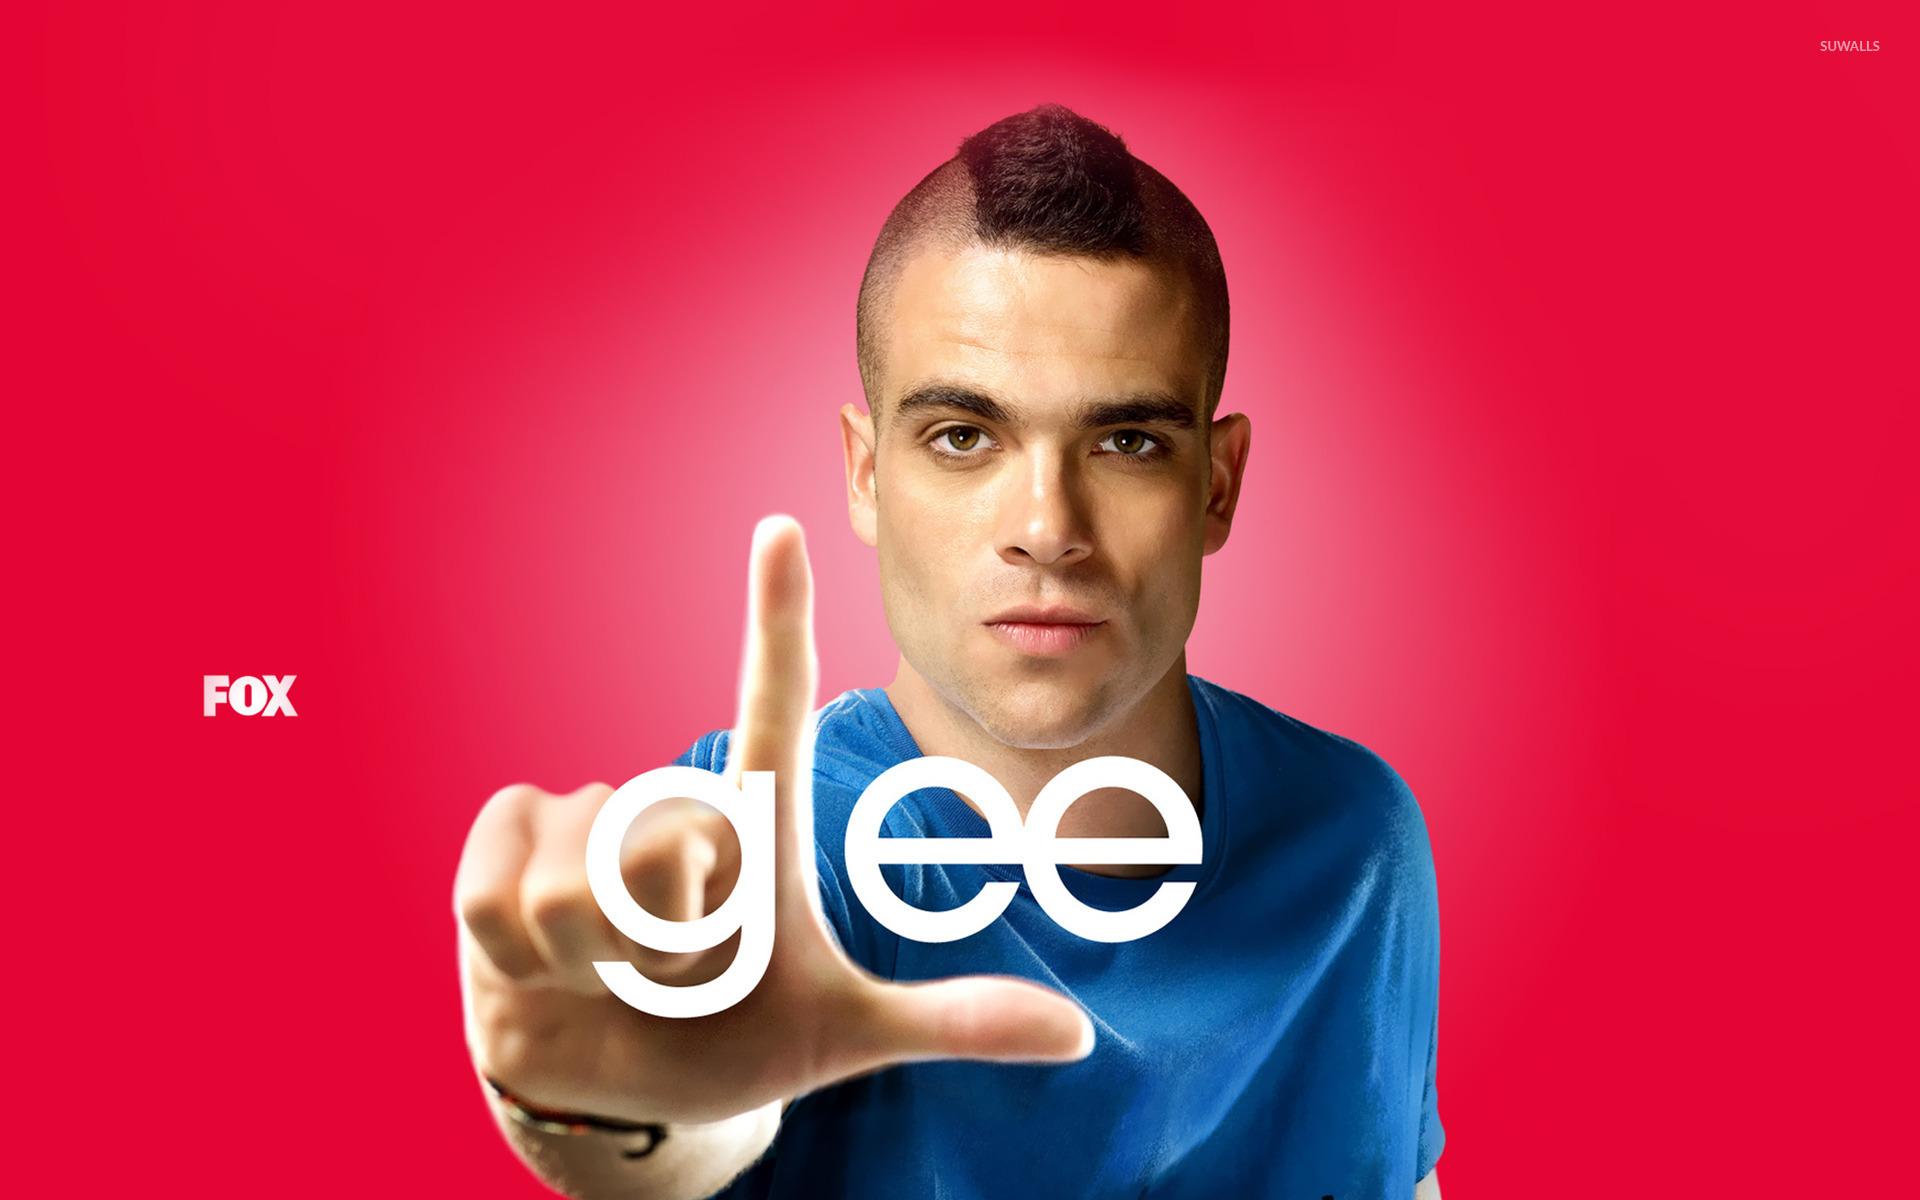 Puck Glee Wallpaper Tv Show Wallpapers 12876